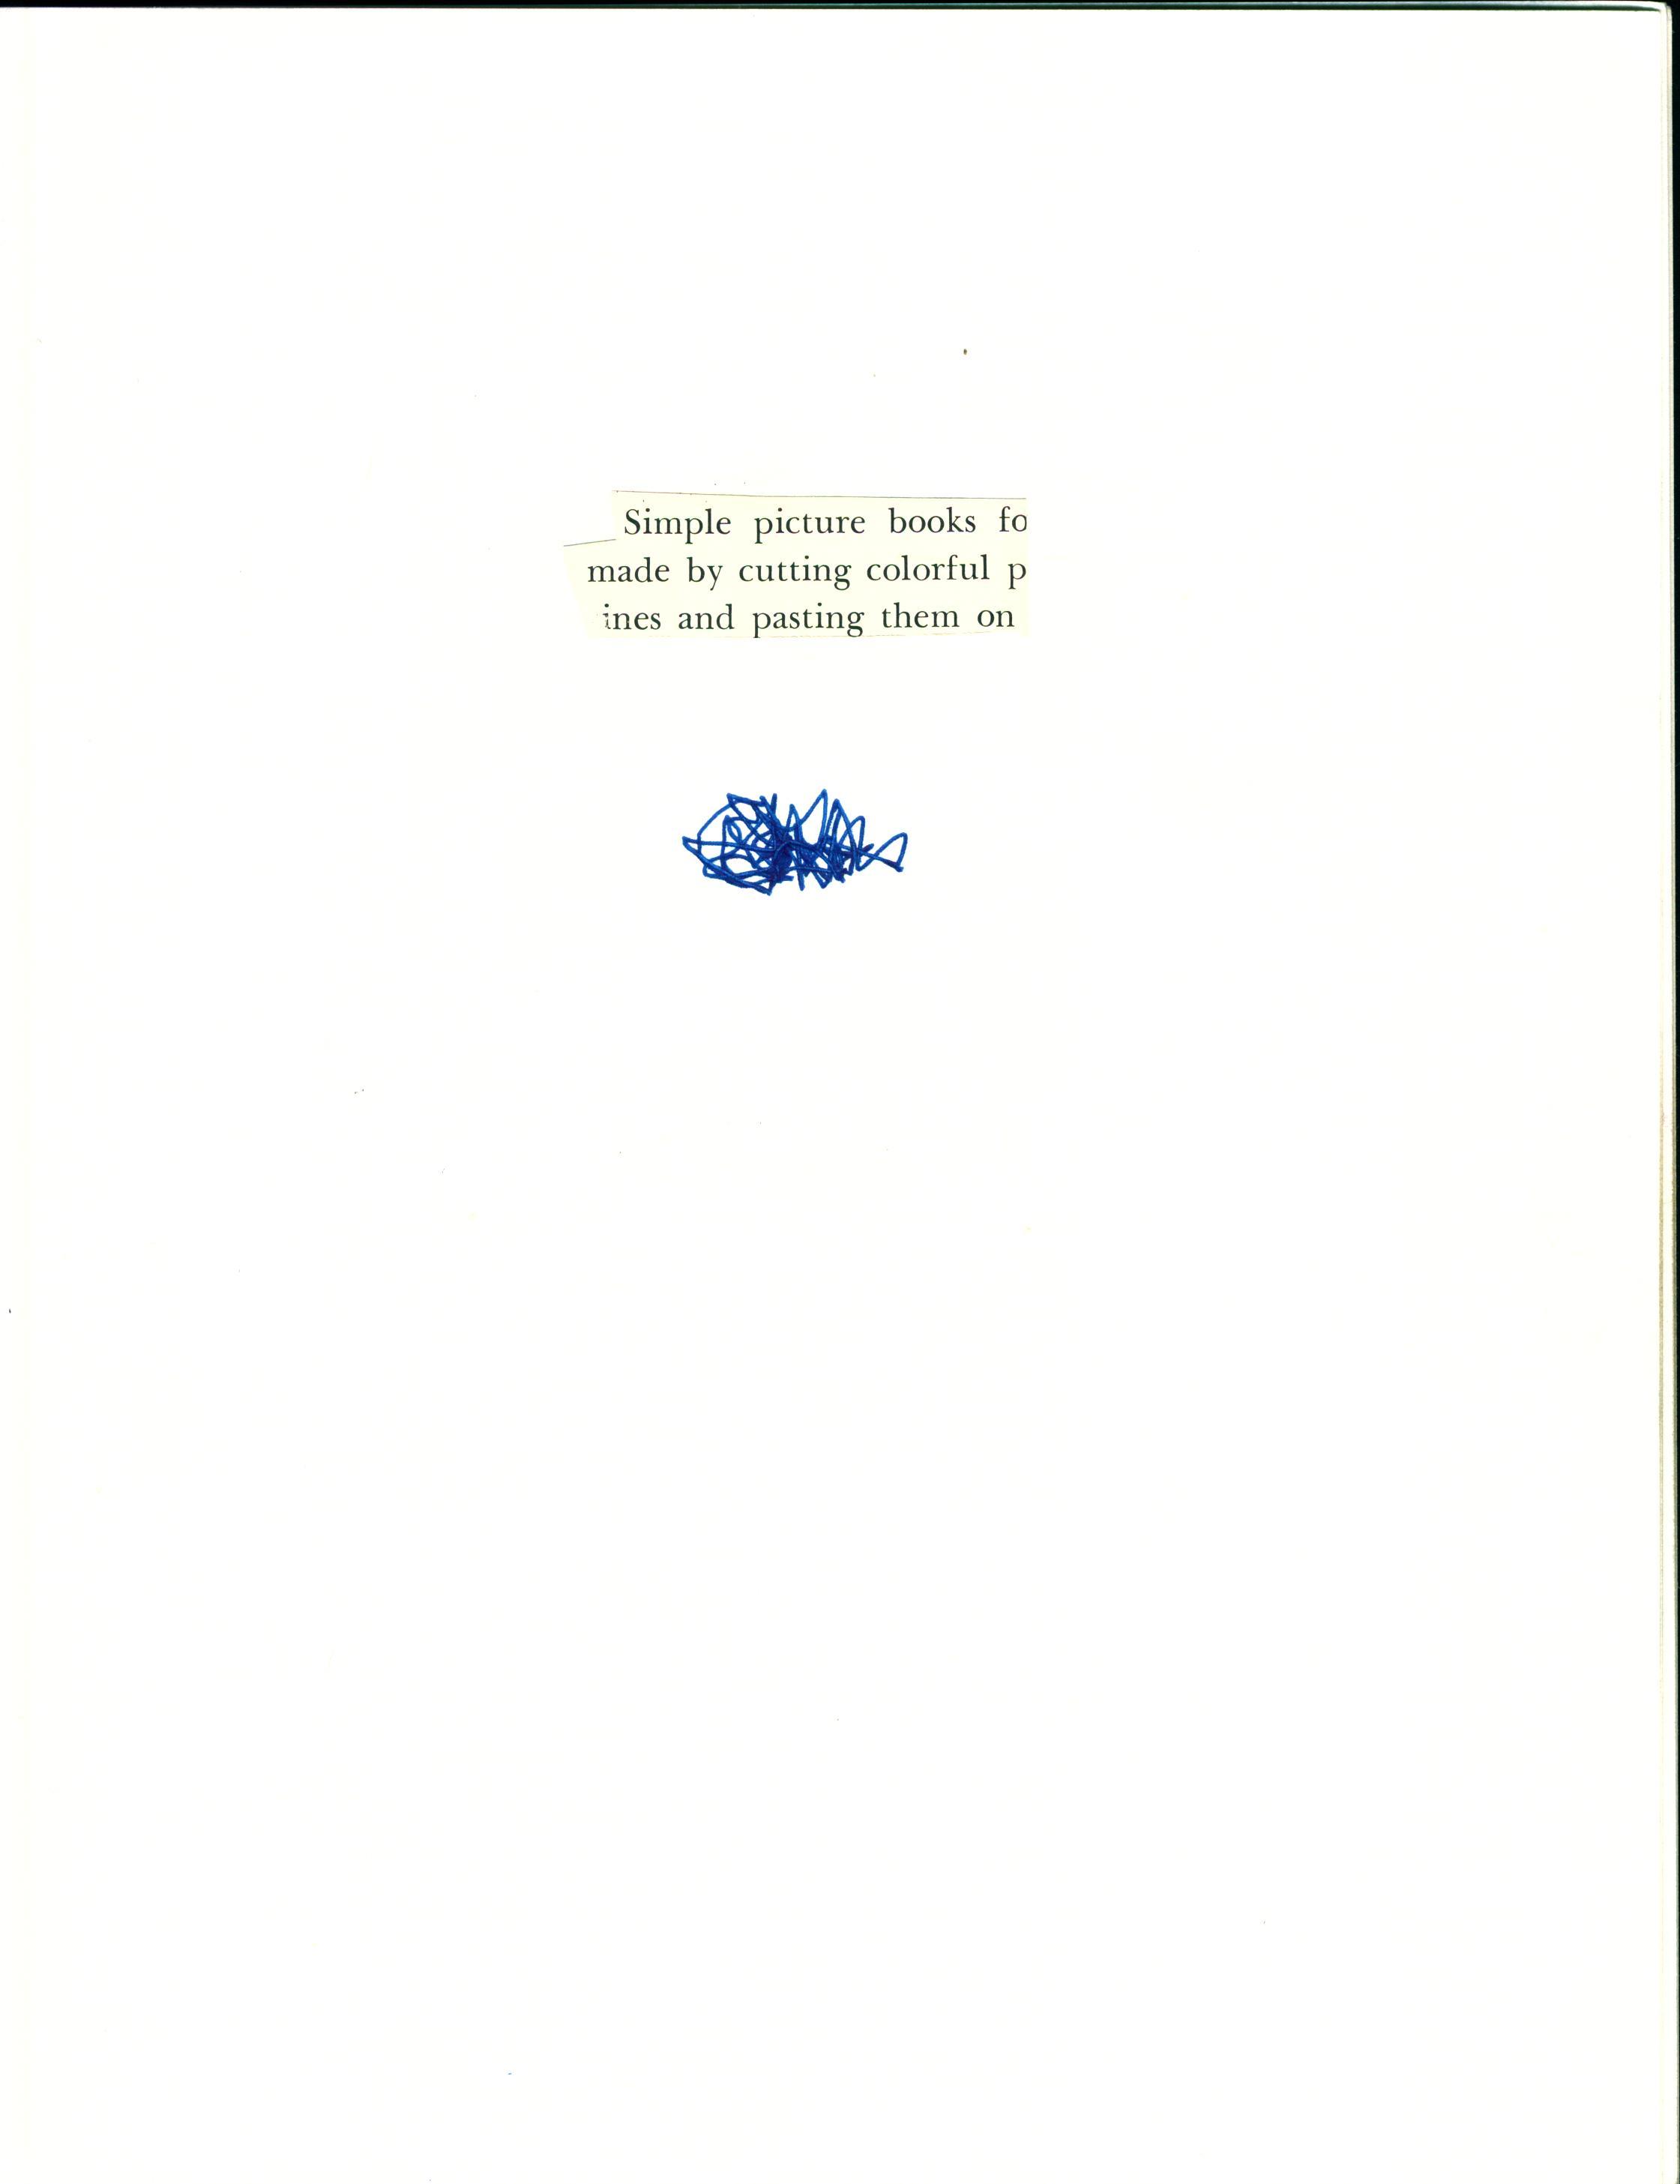 notebook0022.jpg